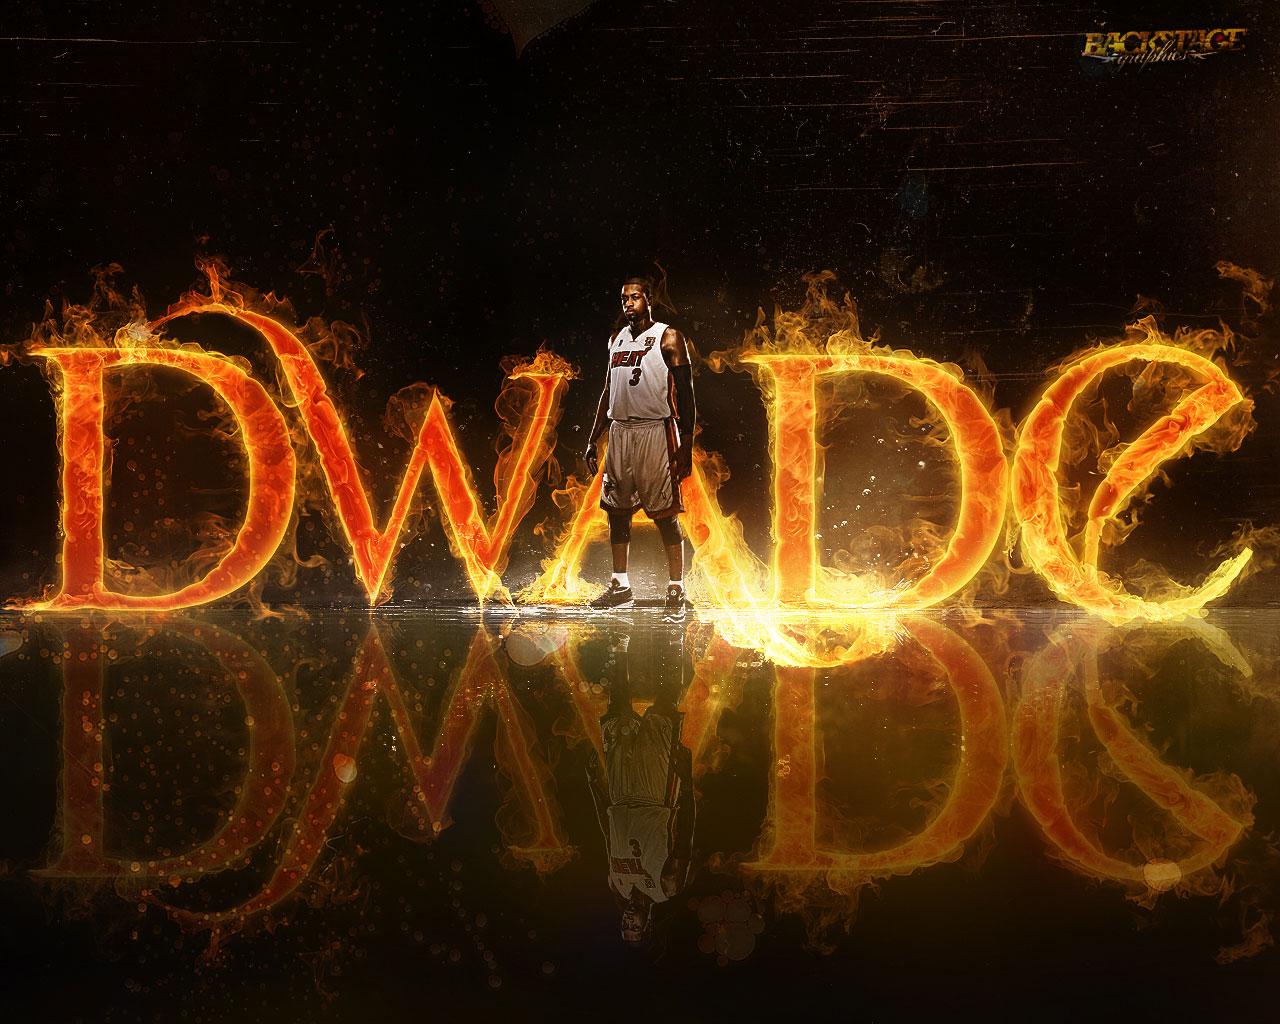 Dwyane Wade Wallpaper Big Fan of NBA   Daily Update 1280x1024